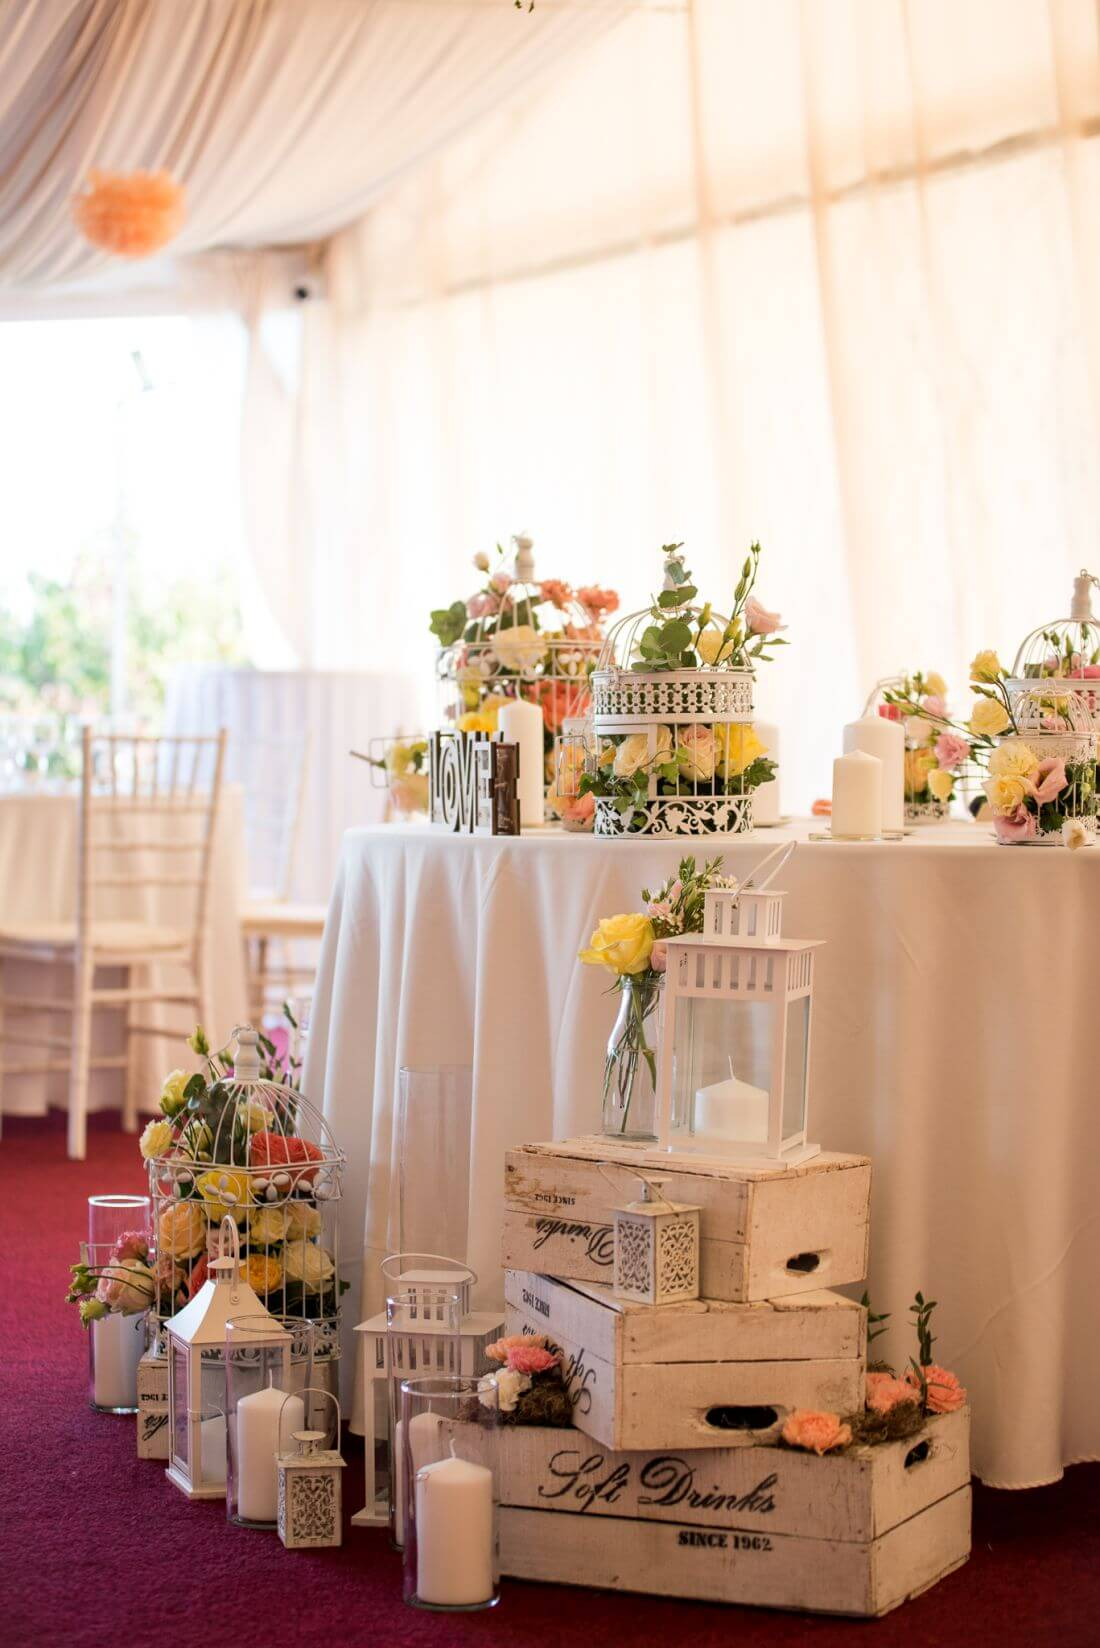 Nunta cu prieteni dragi – Oana si Dani-IDO-Weddings-nuntiinaerliber (9)